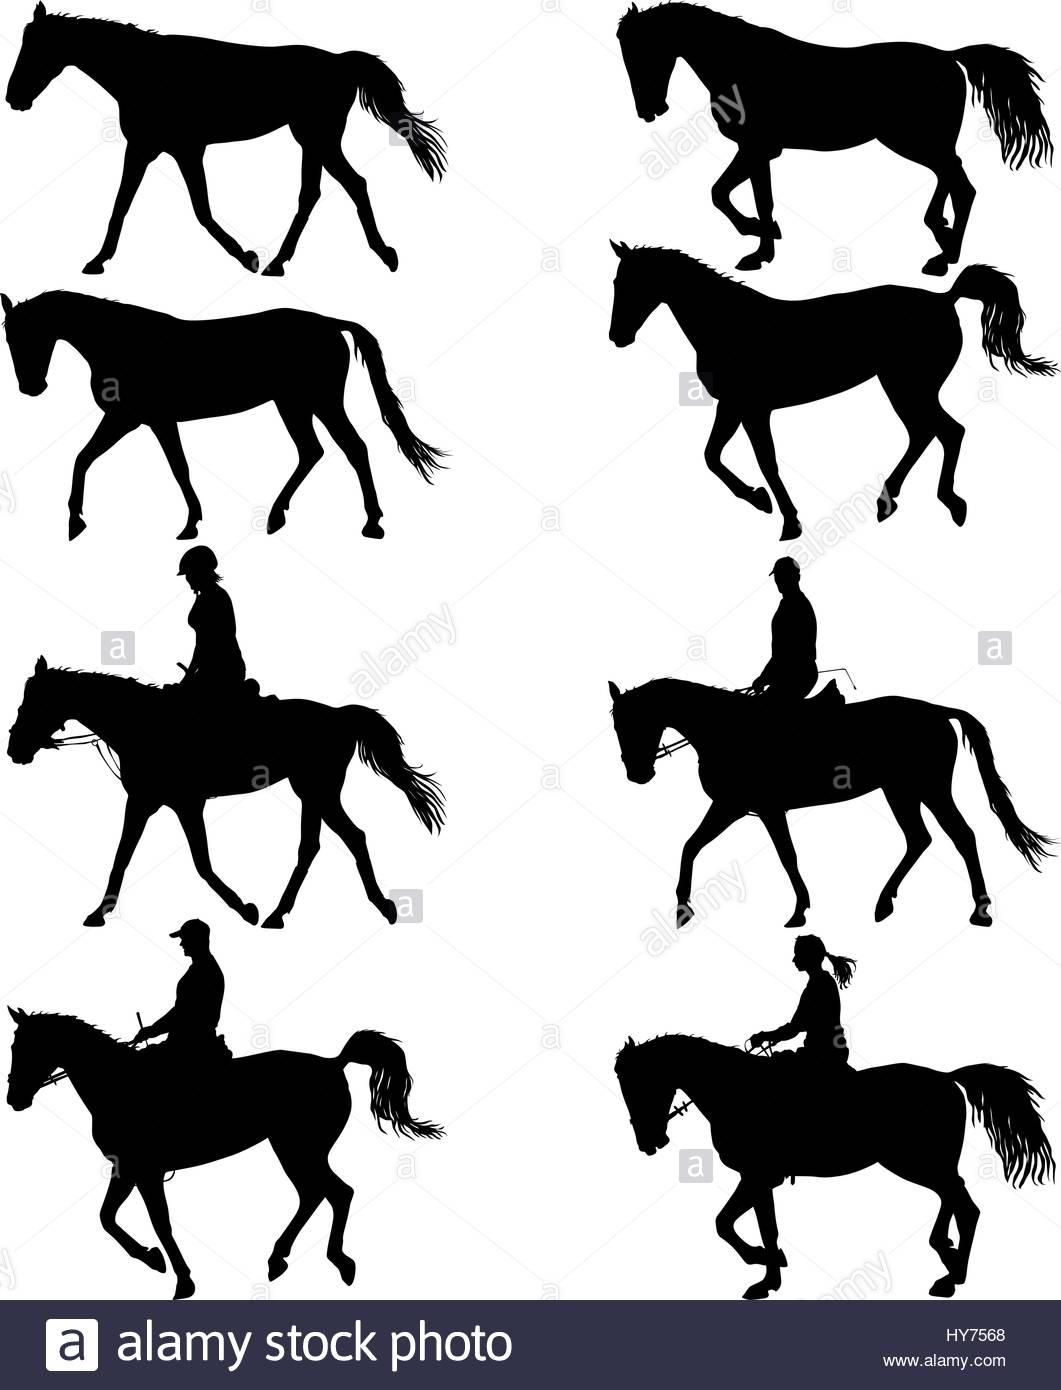 1061x1390 Set Vector Silhouette Of Horse And Jockey Stock Vector Art